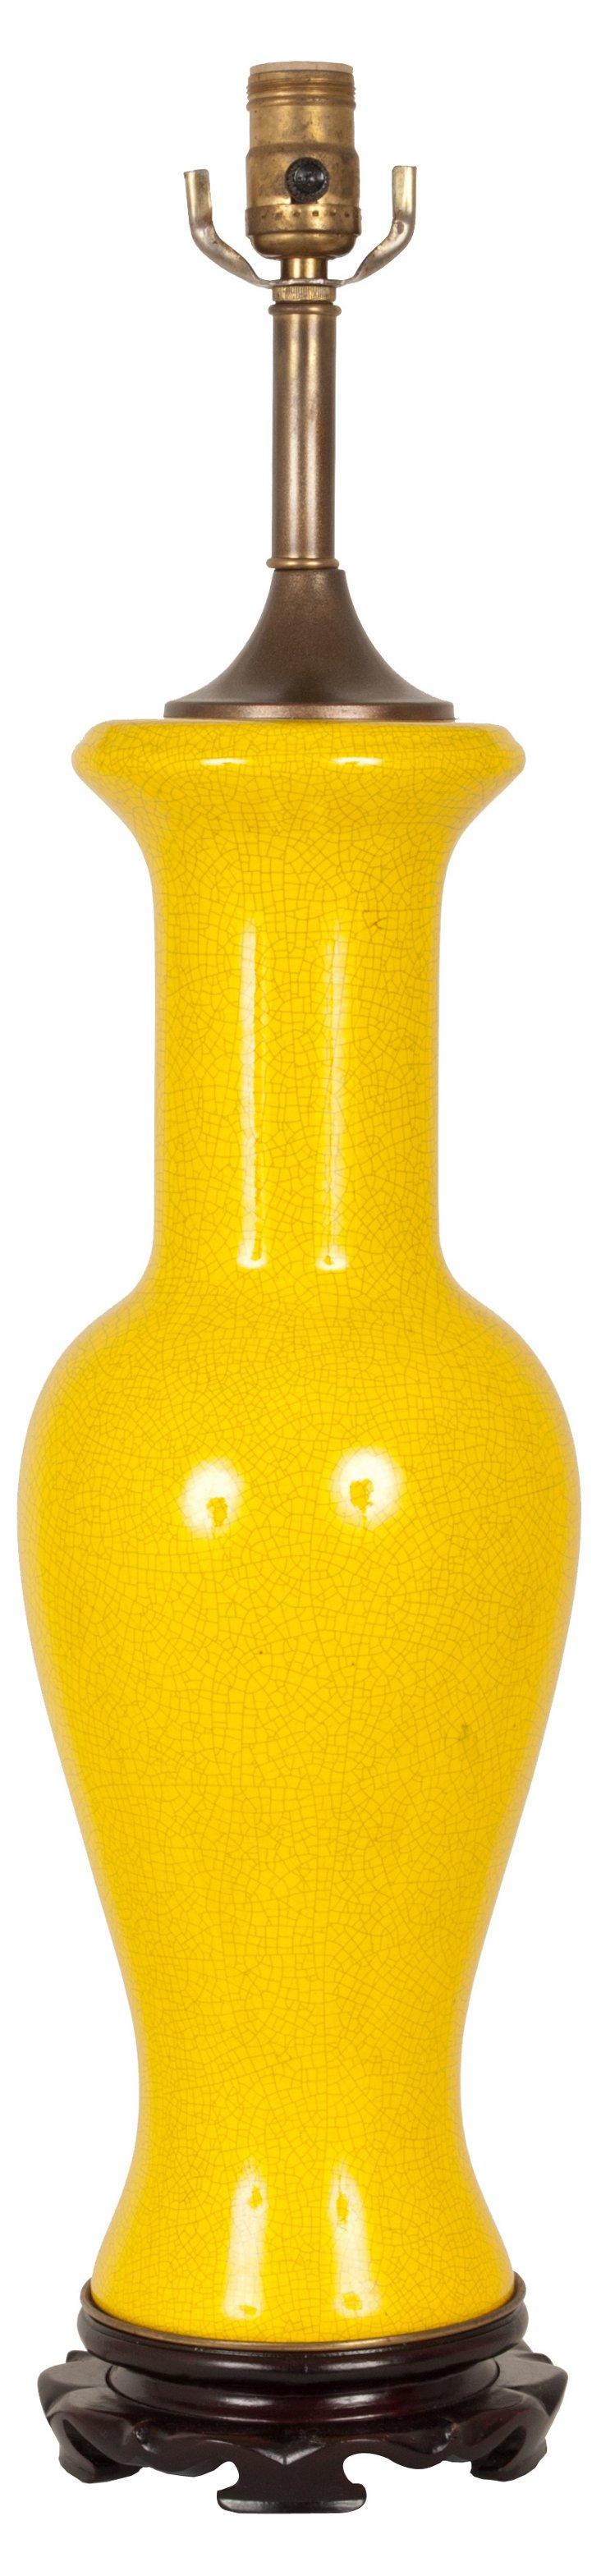 Canary Yellow Lamp